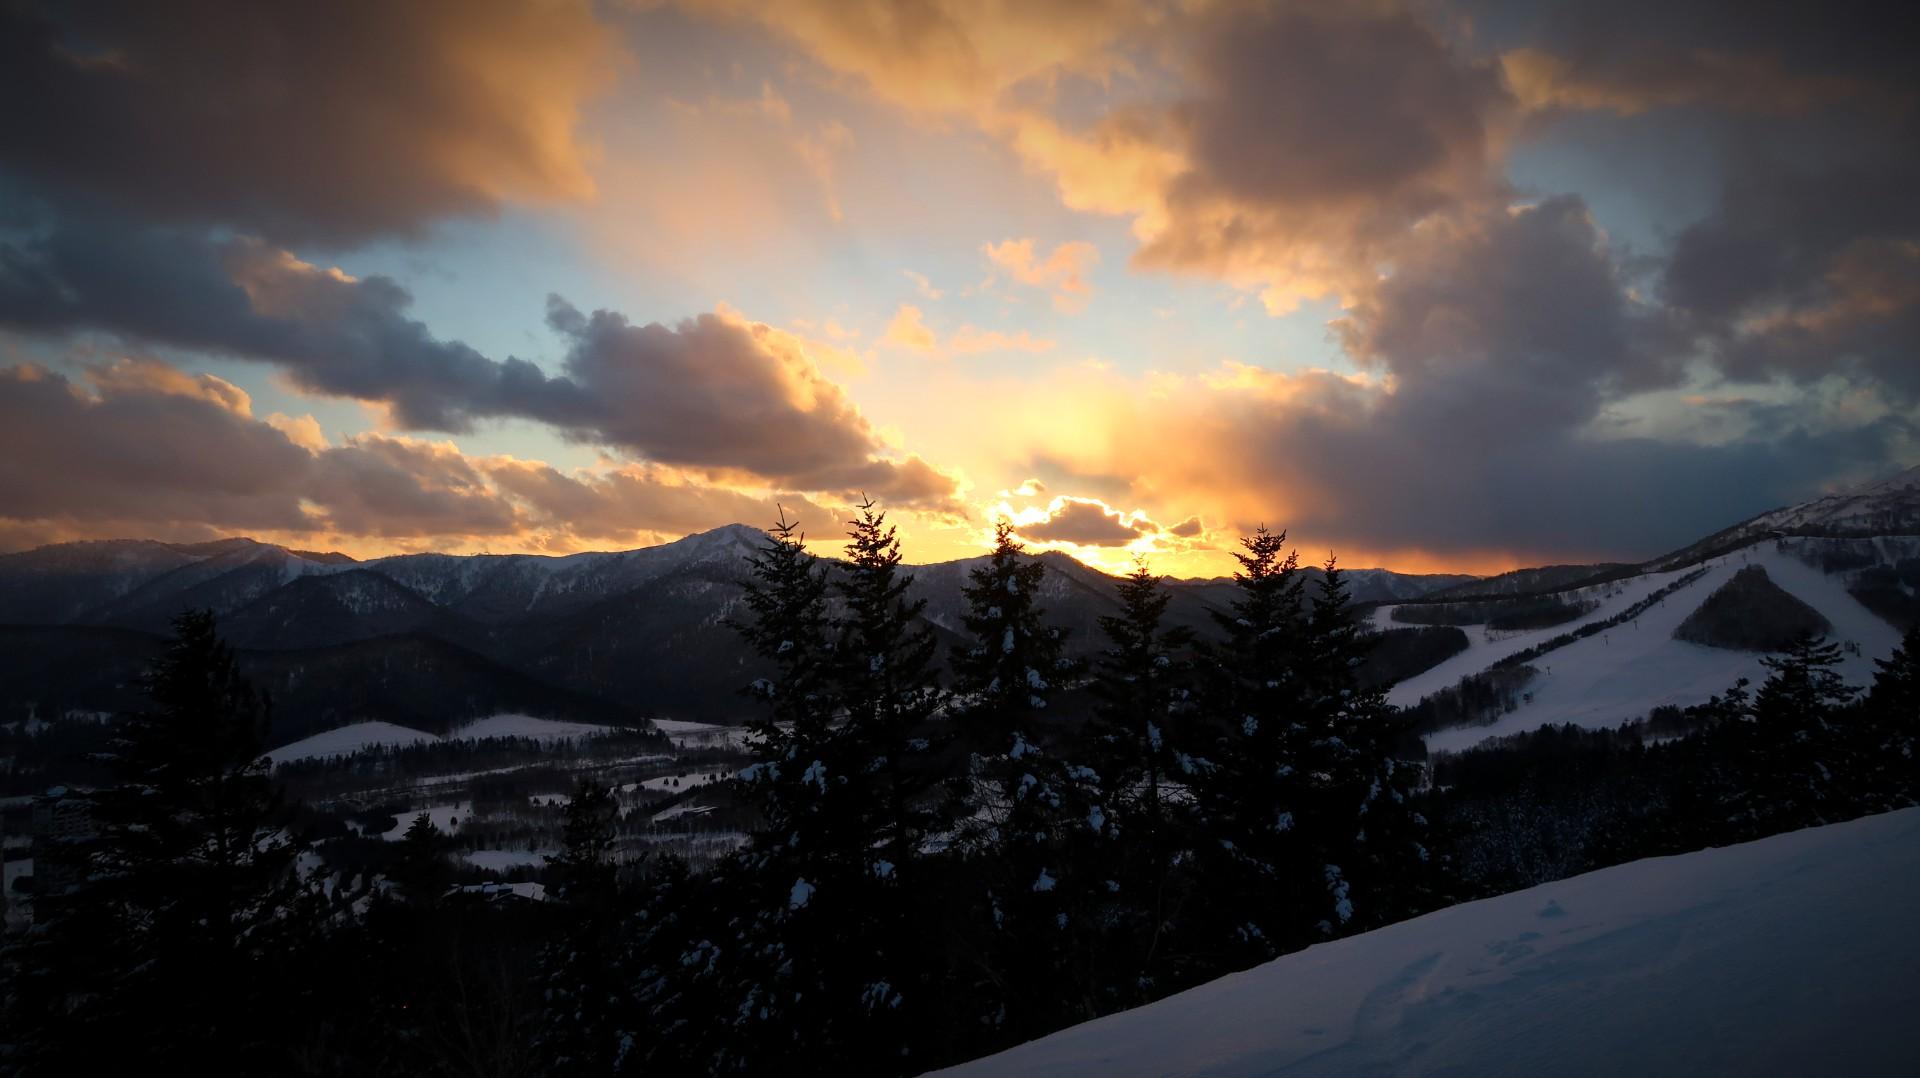 tomamu ski resort hokkaido japan study abroad school trip educational tour